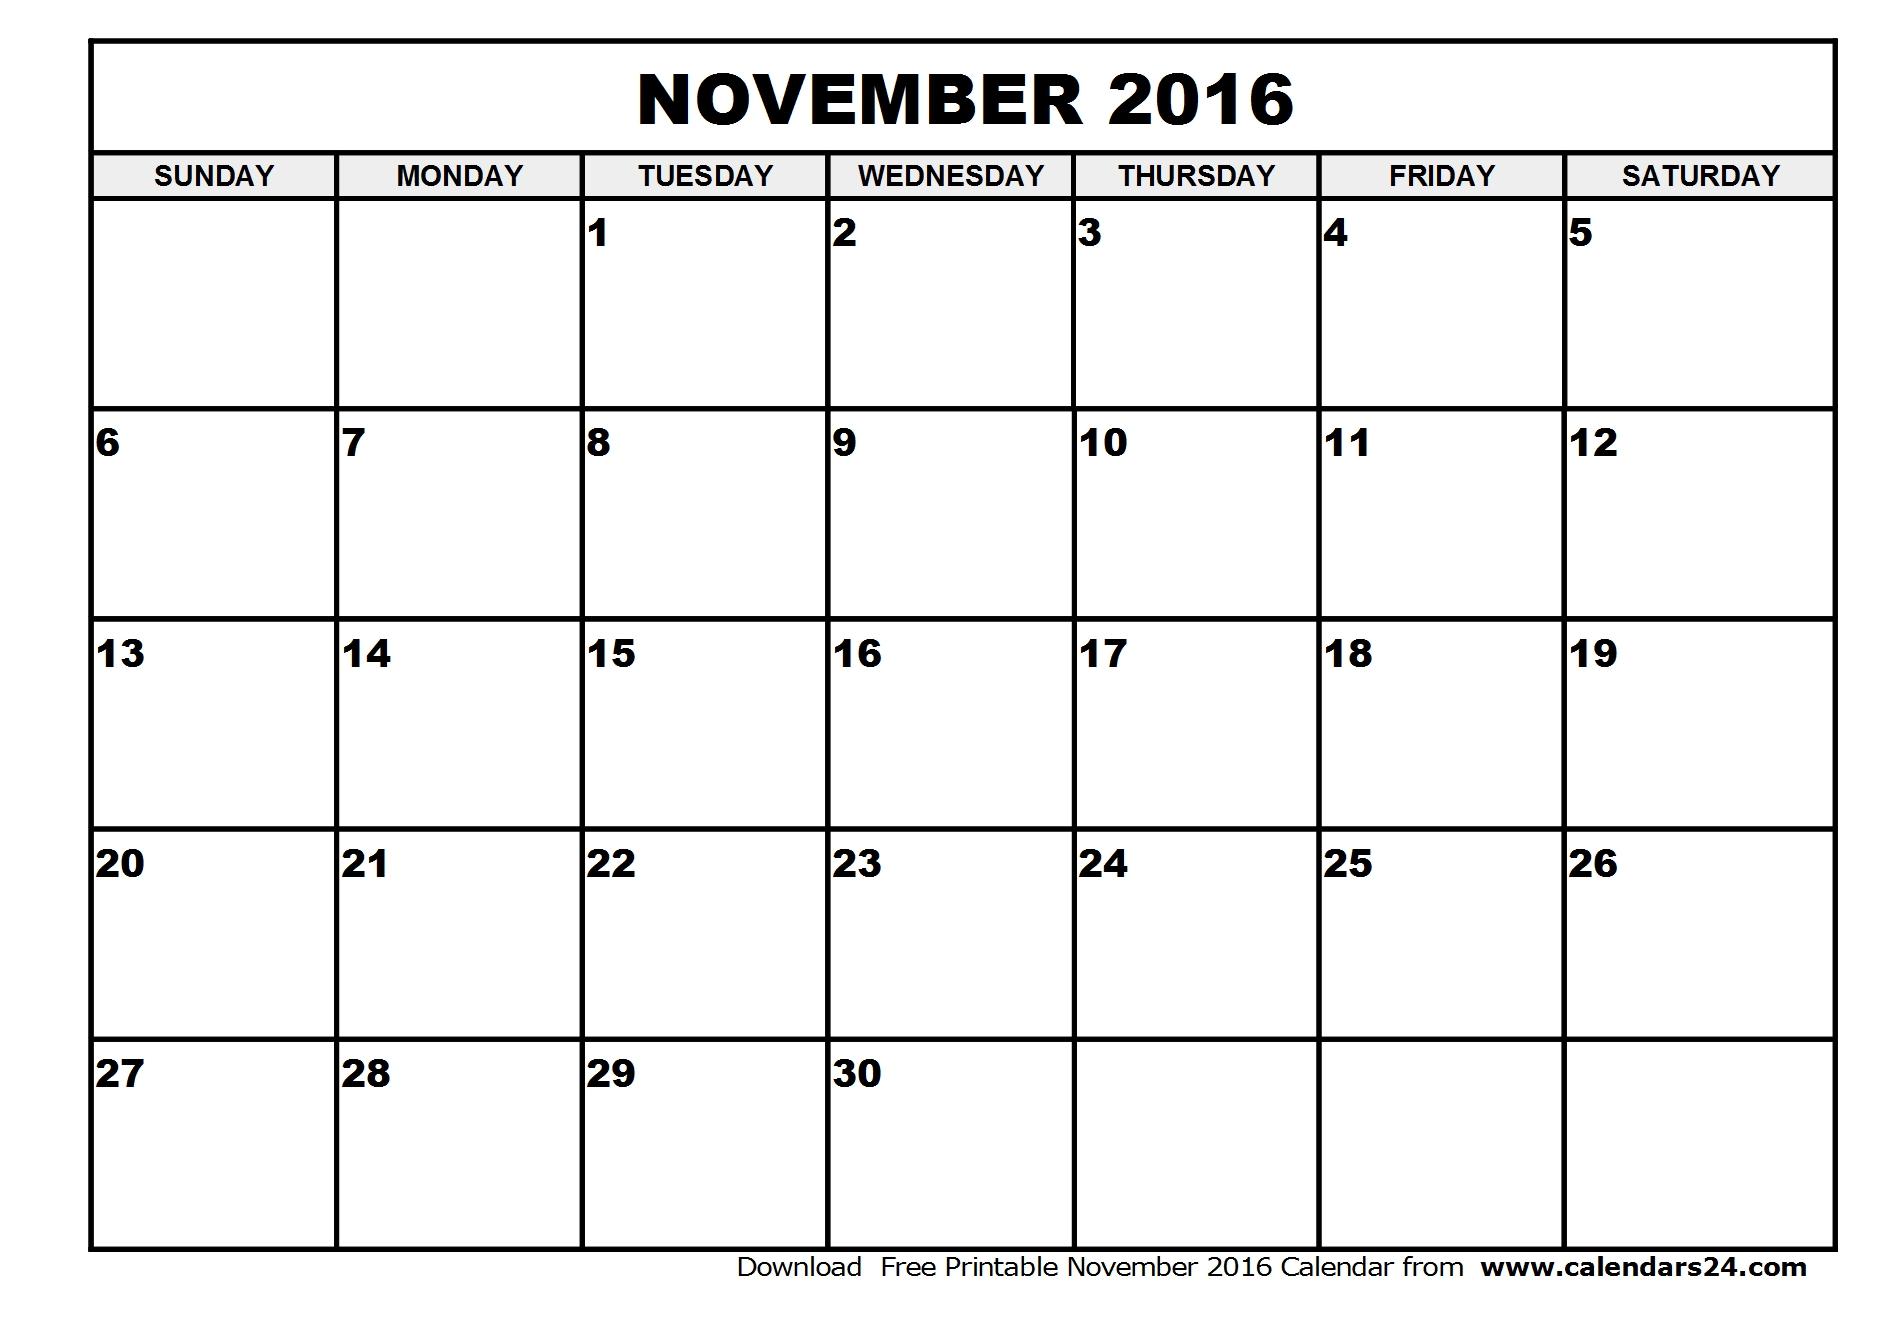 November 2016 Calendar & December 2016 Calendar